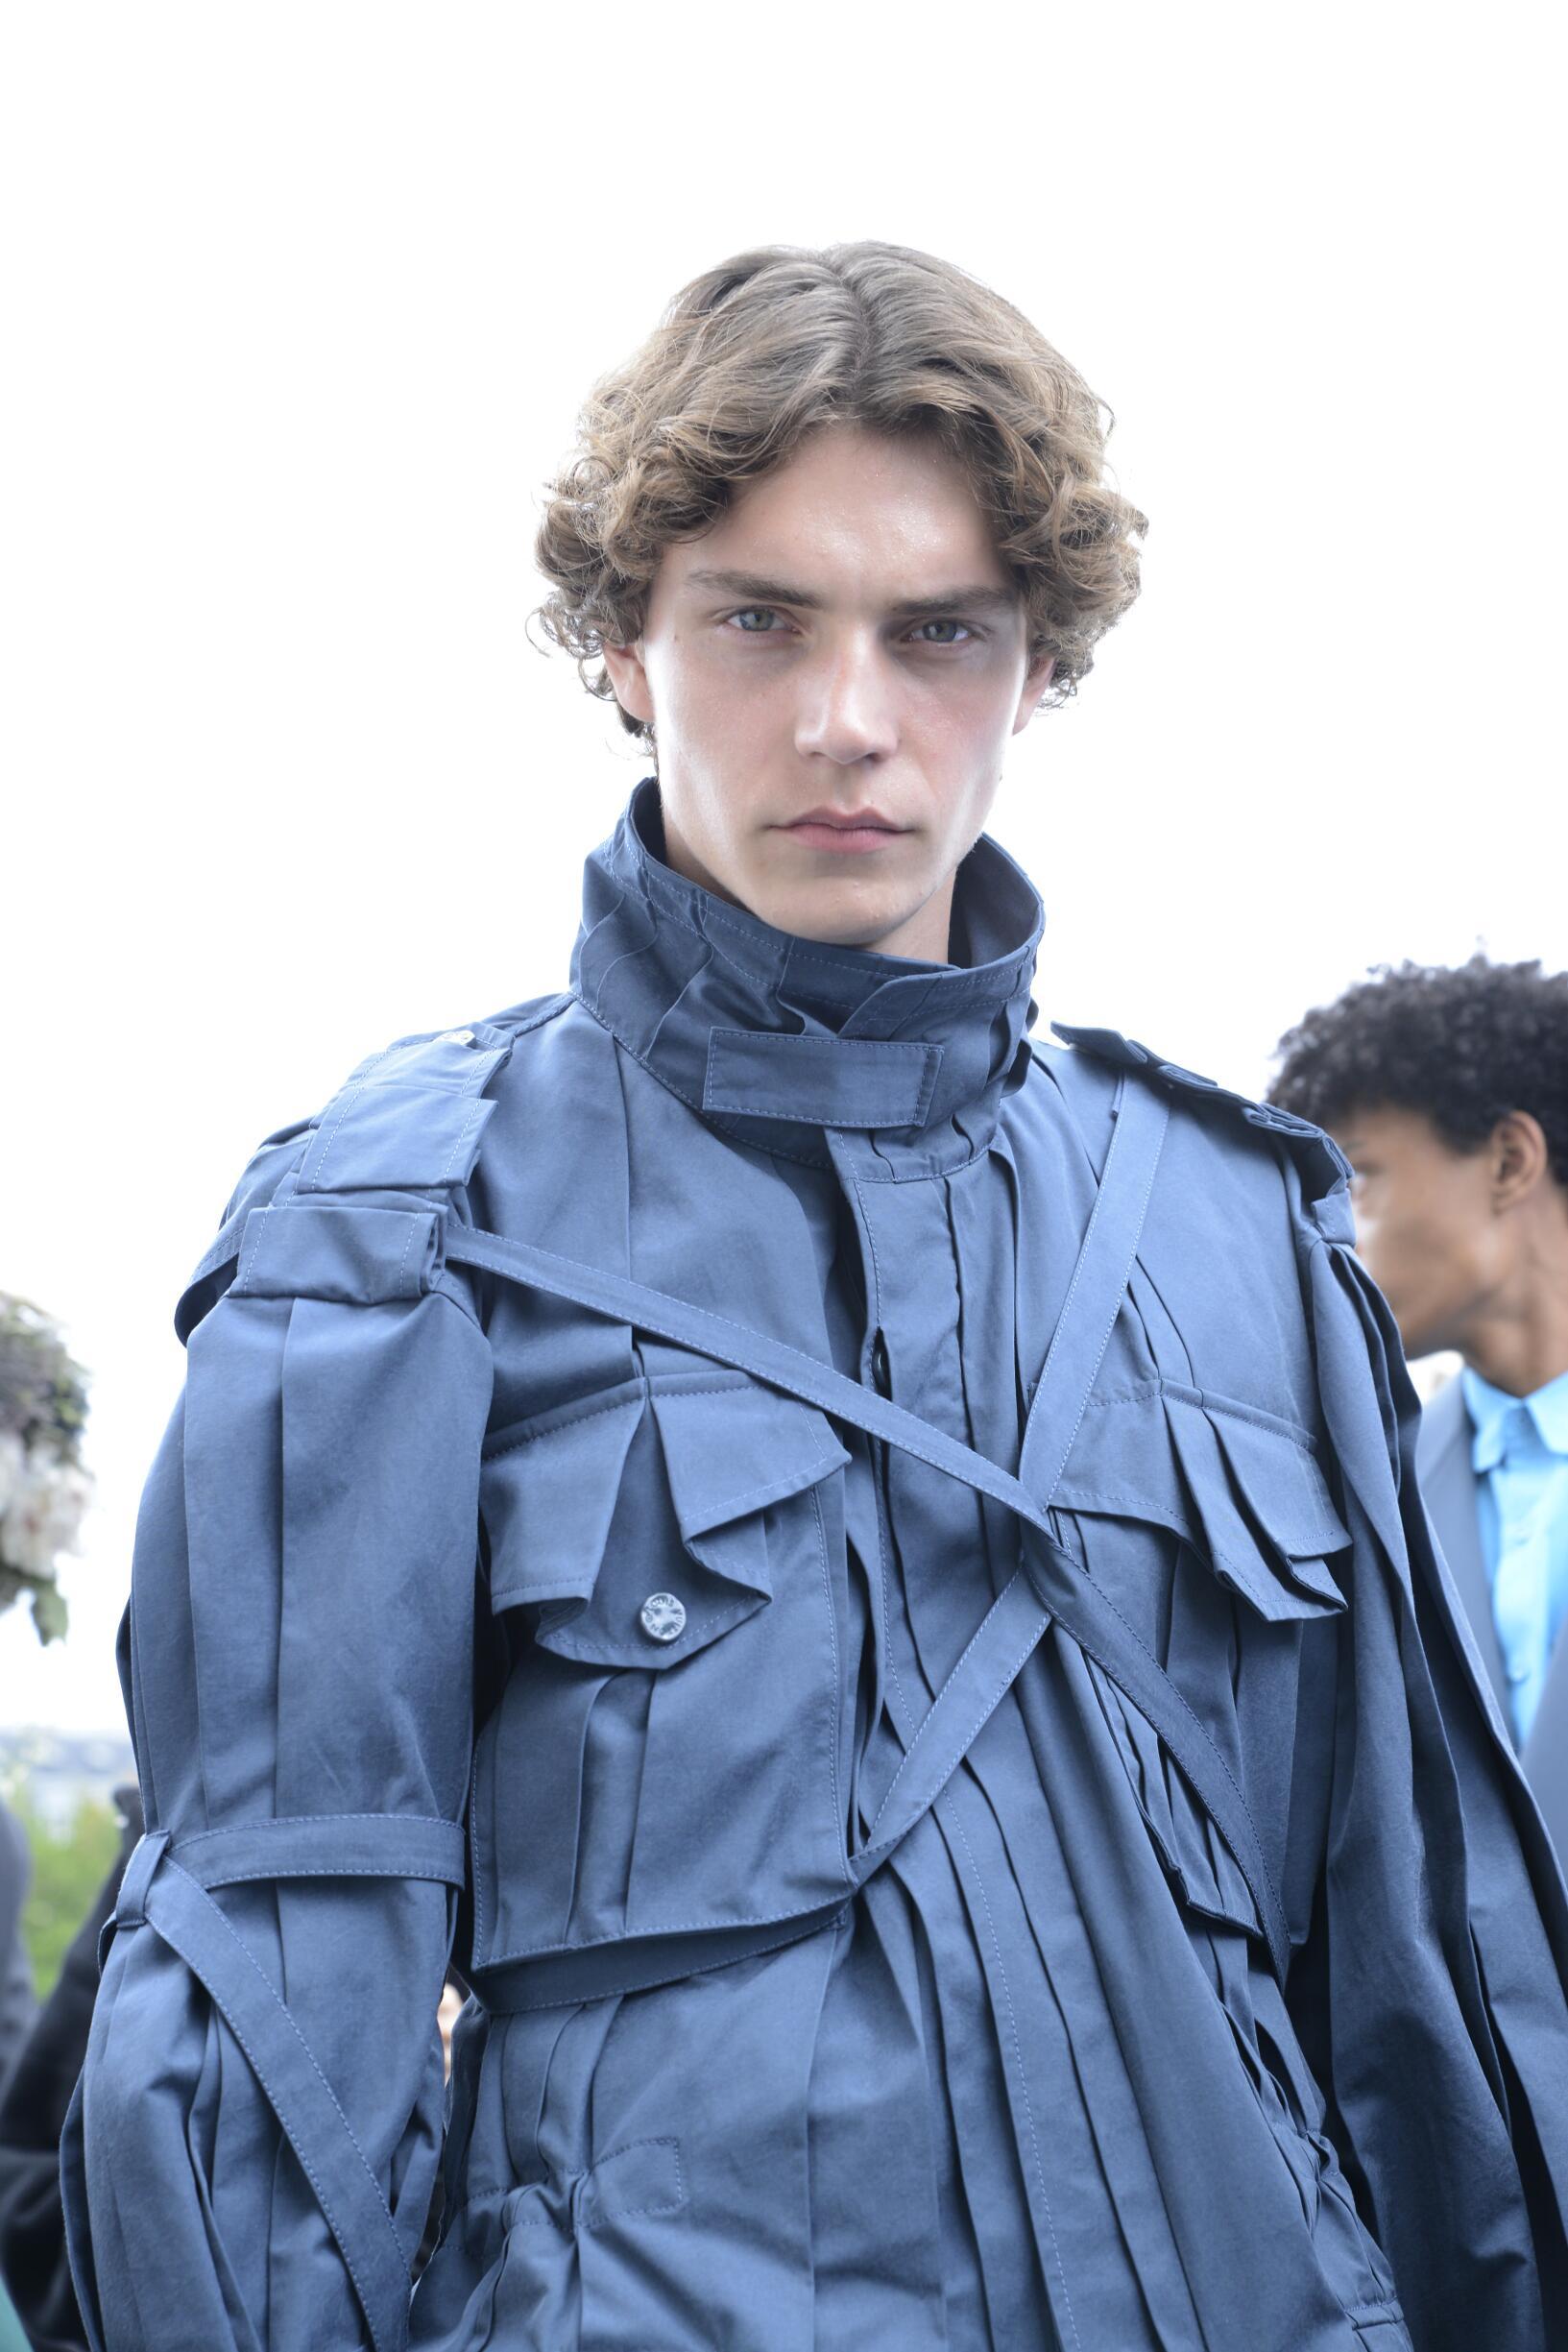 Model Backstage Louis Vuitton Spring Summer 2020 Collection Paris Fashion Week